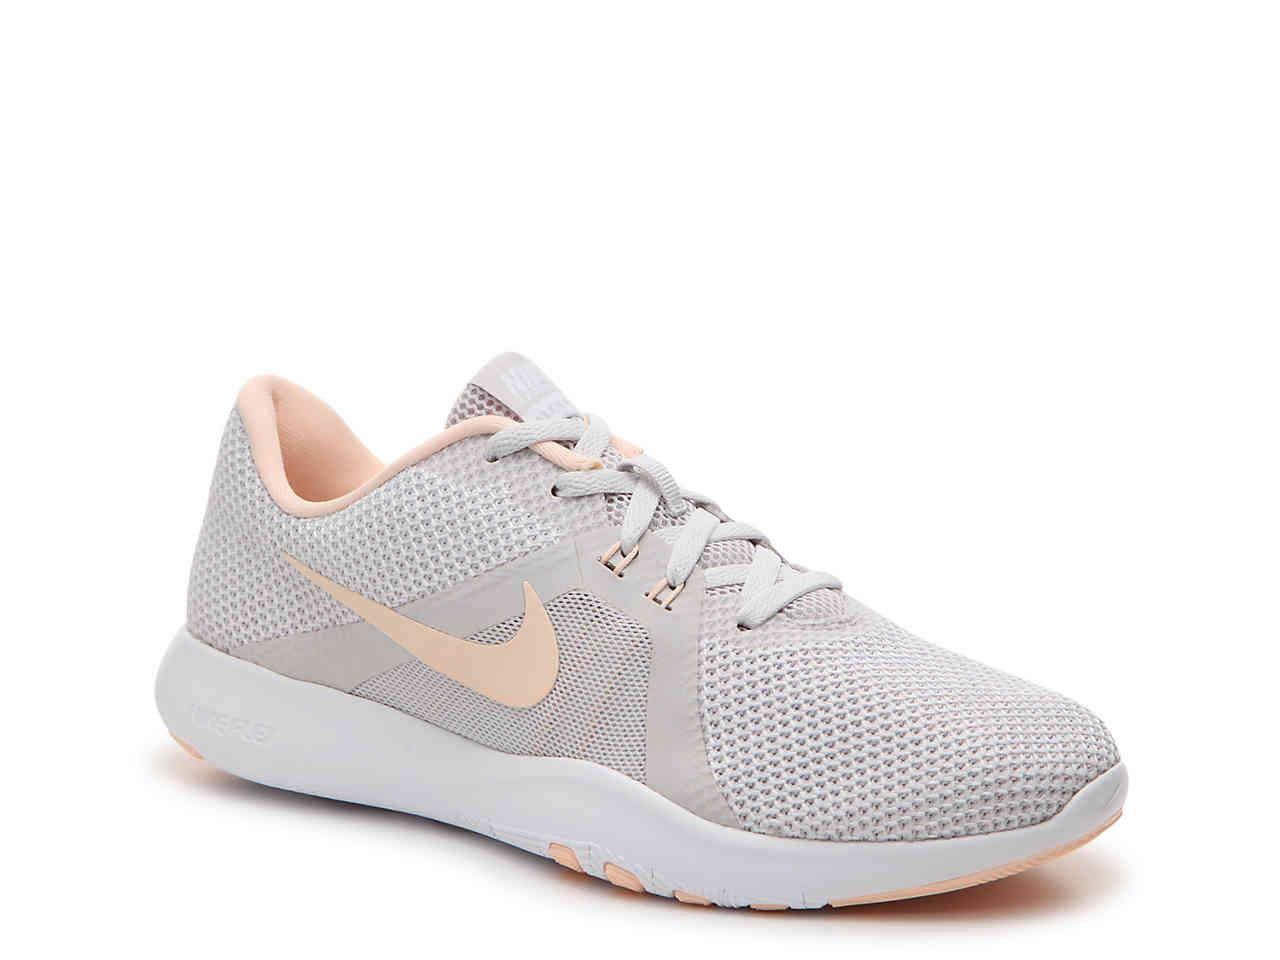 low priced 252b4 1c132 Nike Flex Tr 8 Lightweight Training Shoe in Gray - Lyst